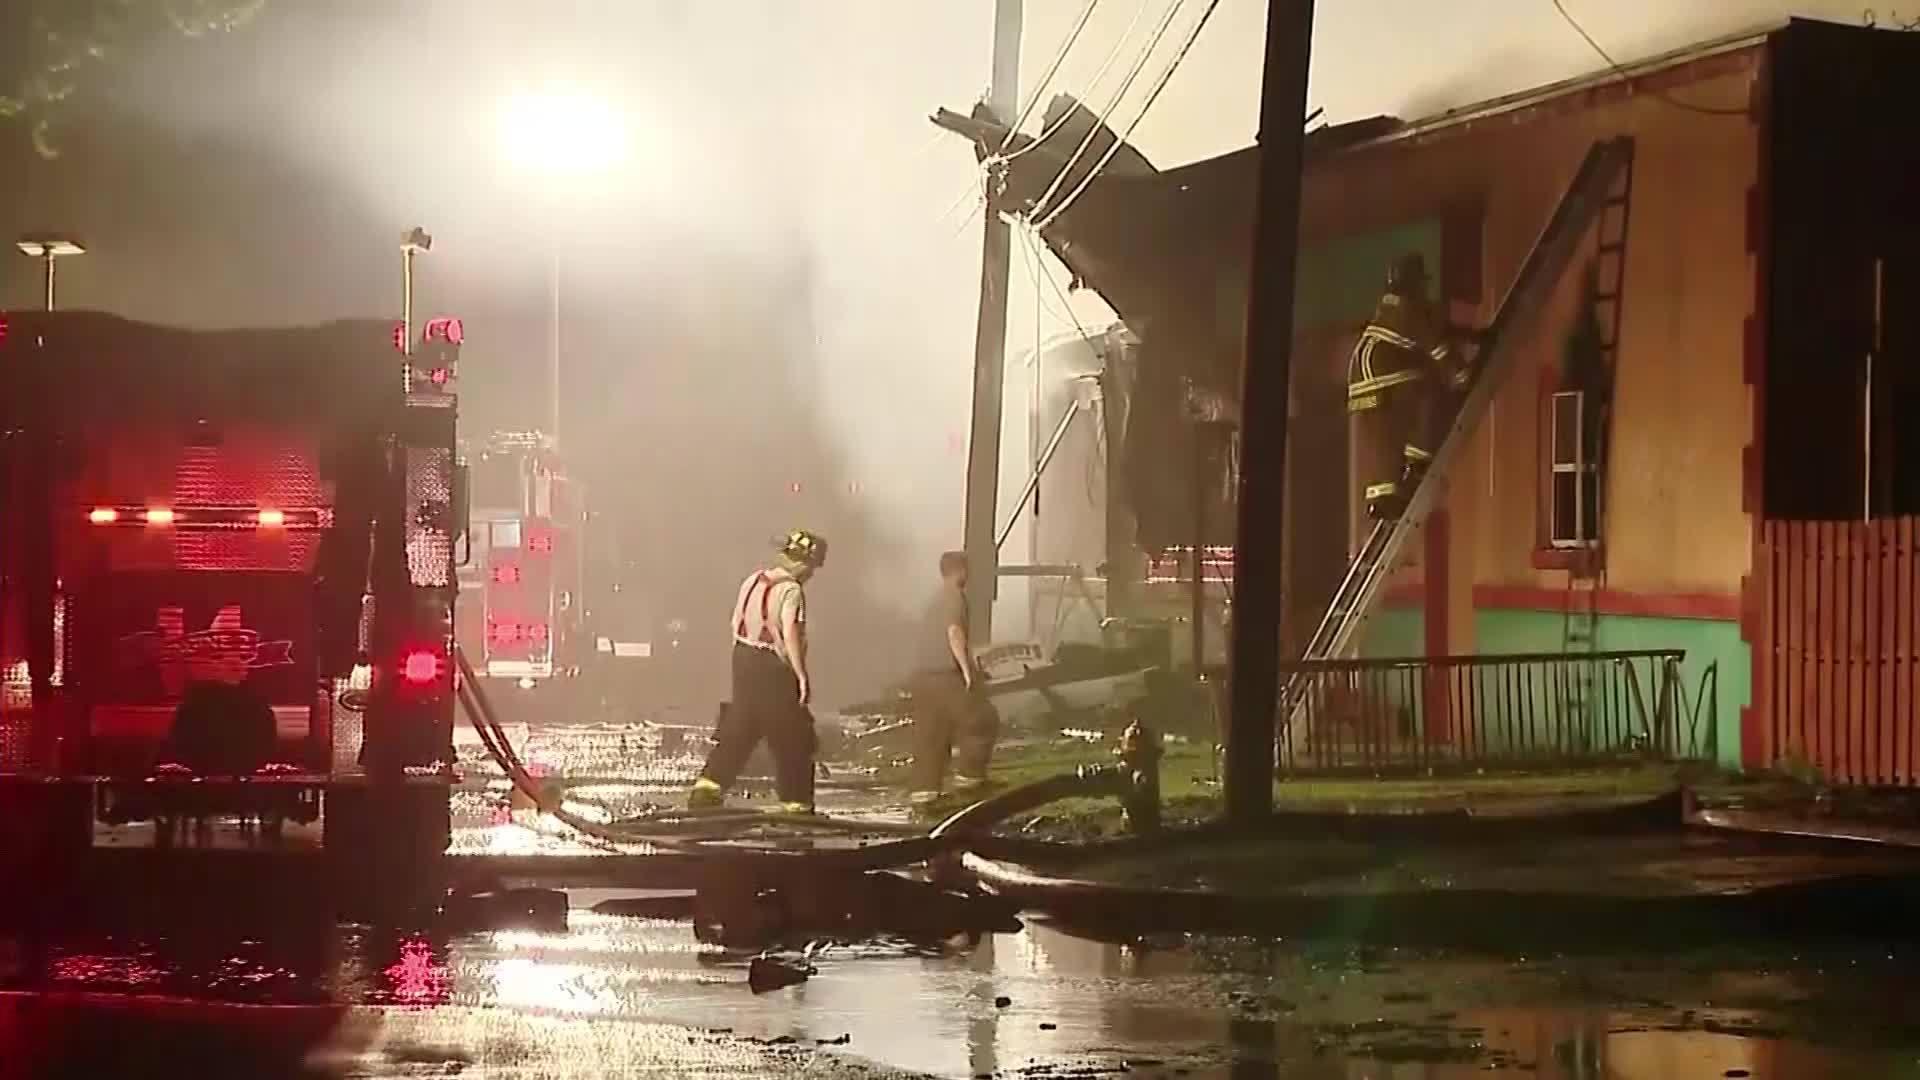 Flag_Survives_Bar_Fire_in_Pennsylvania_0_20180519220106